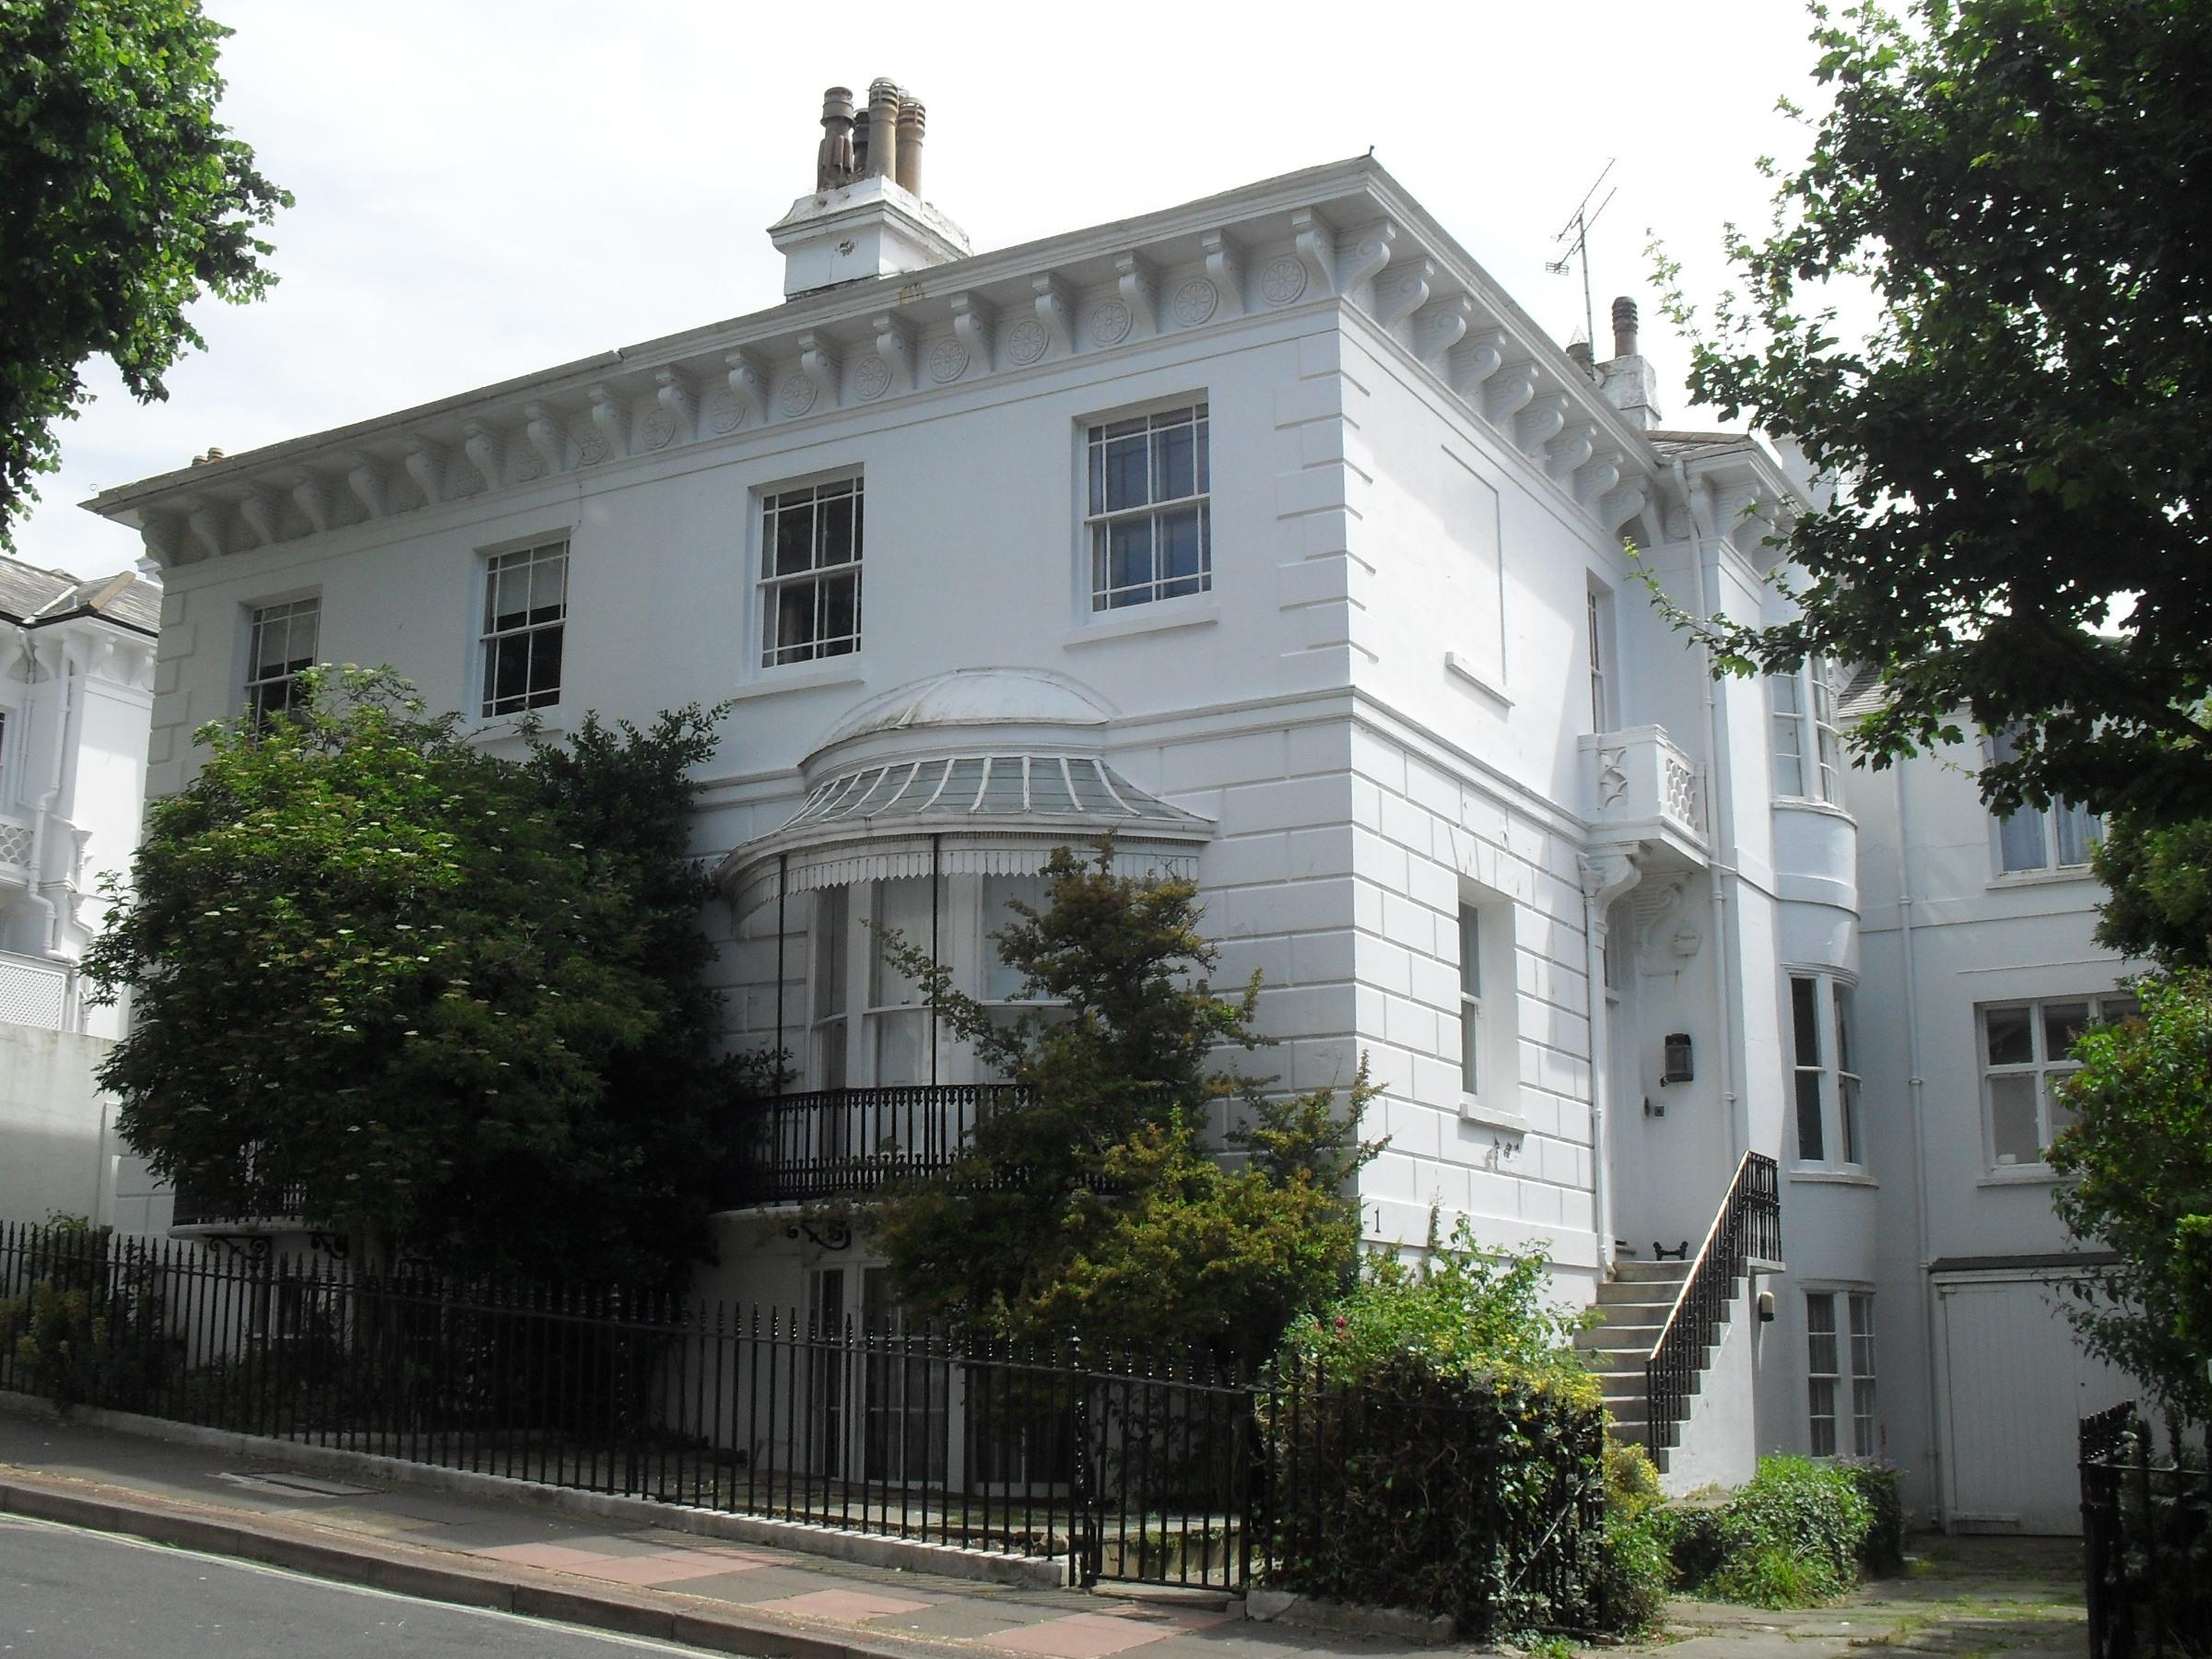 Montpelier brighton wikiwand for Brighton house